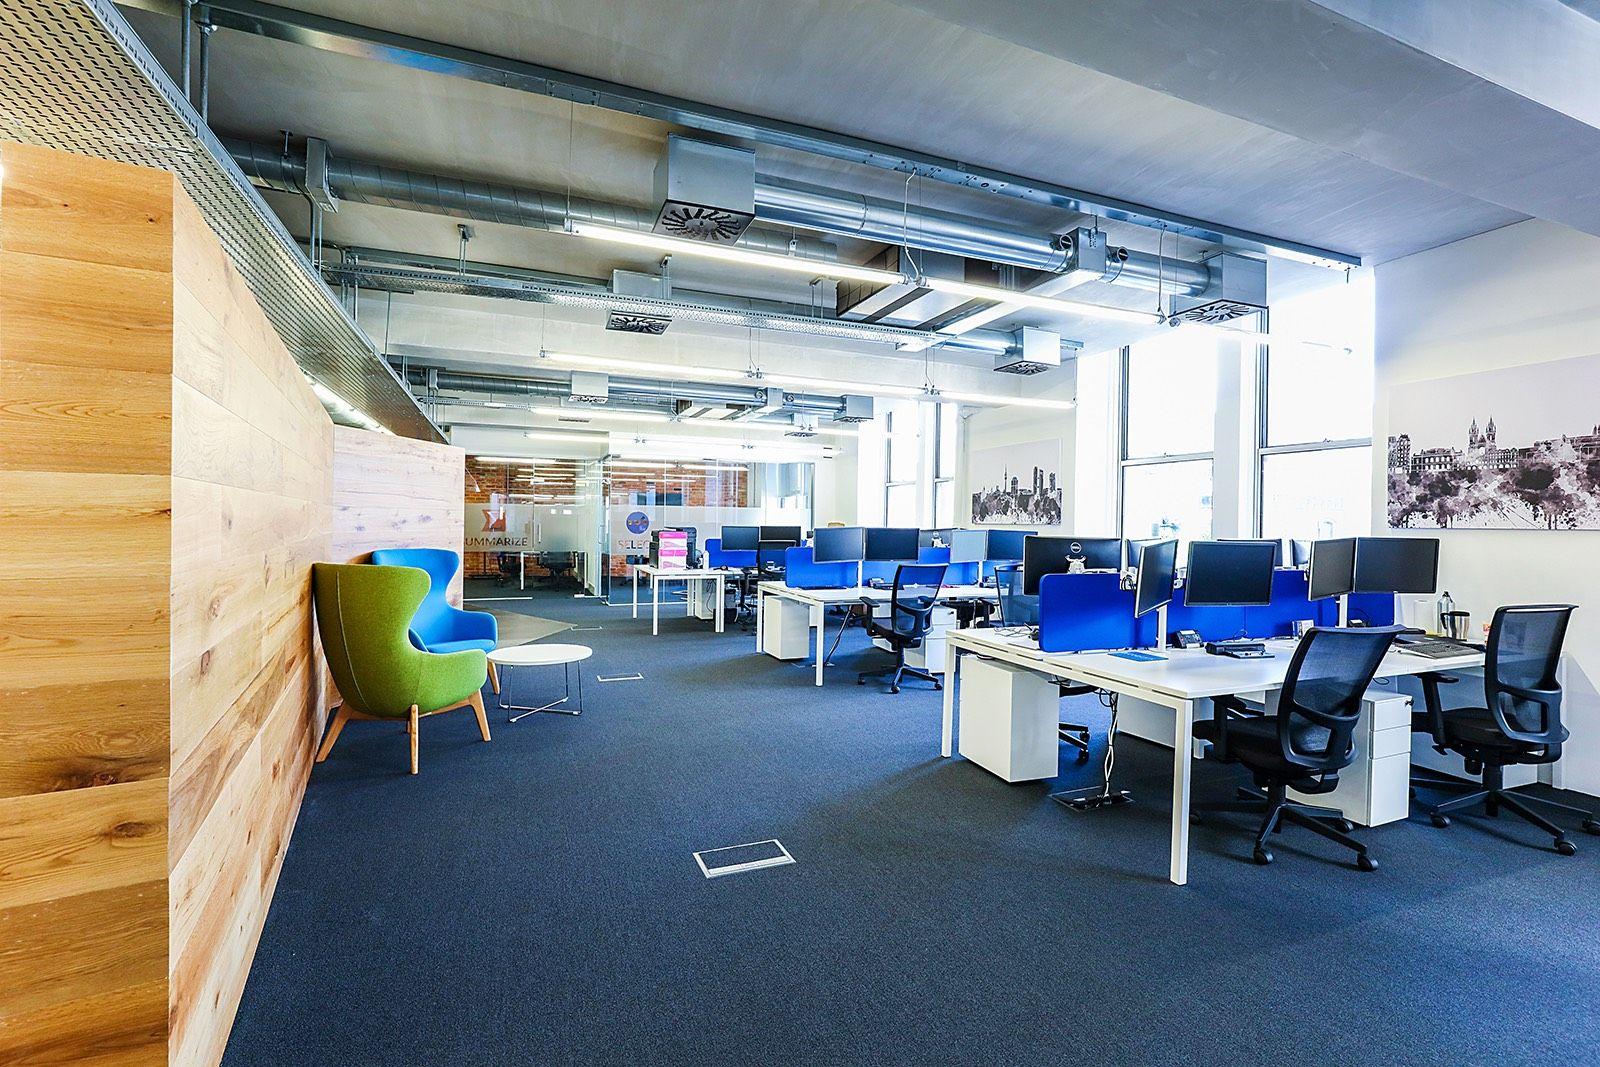 new office designs. A Look Inside Alteryx\u0027s New London Office - Officelovin\u0027 Designs